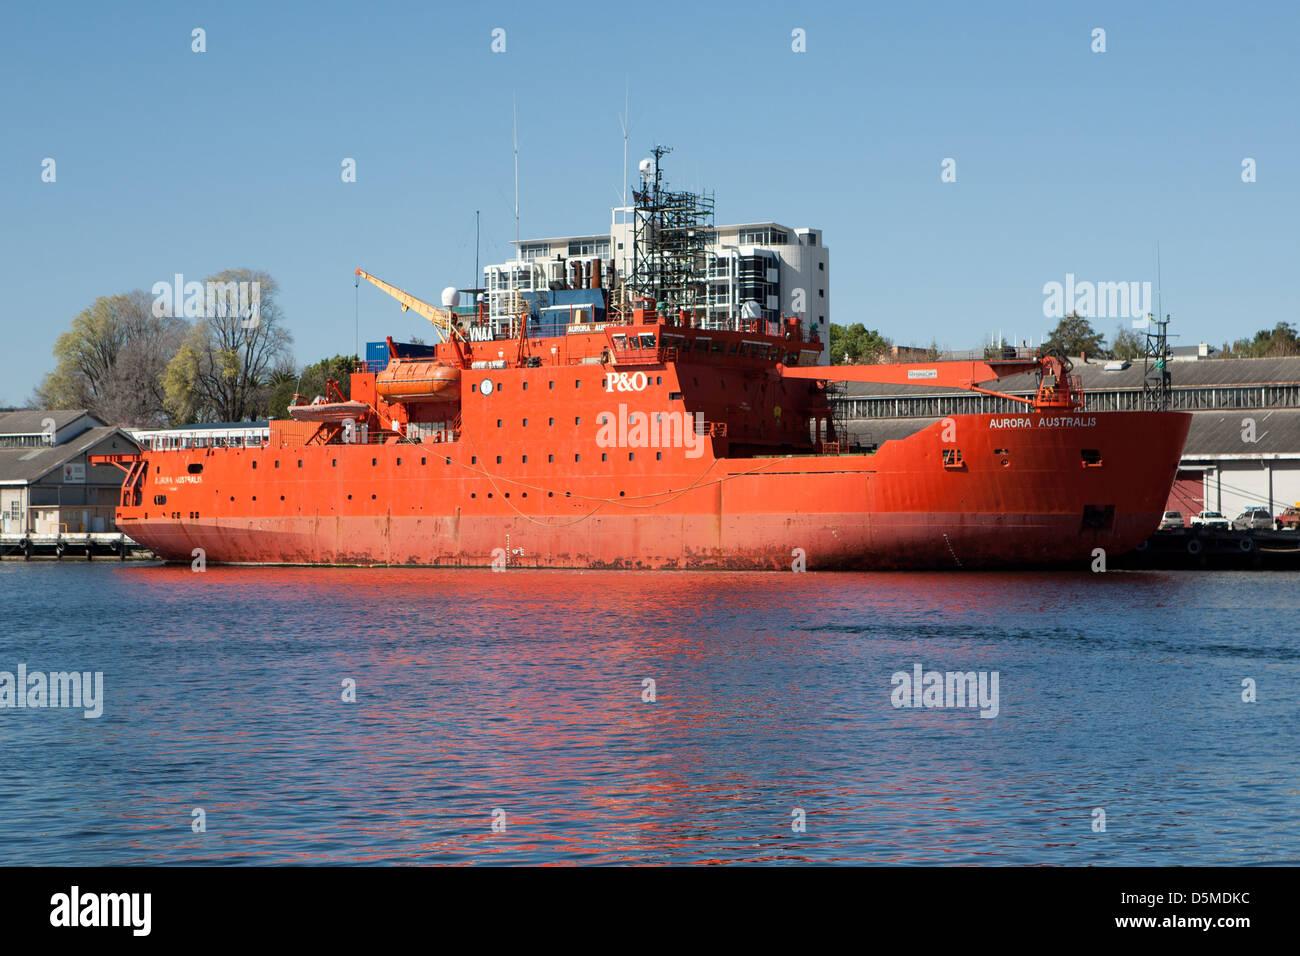 Aurora Australis docked in Hobart, Tasmania - Stock Image